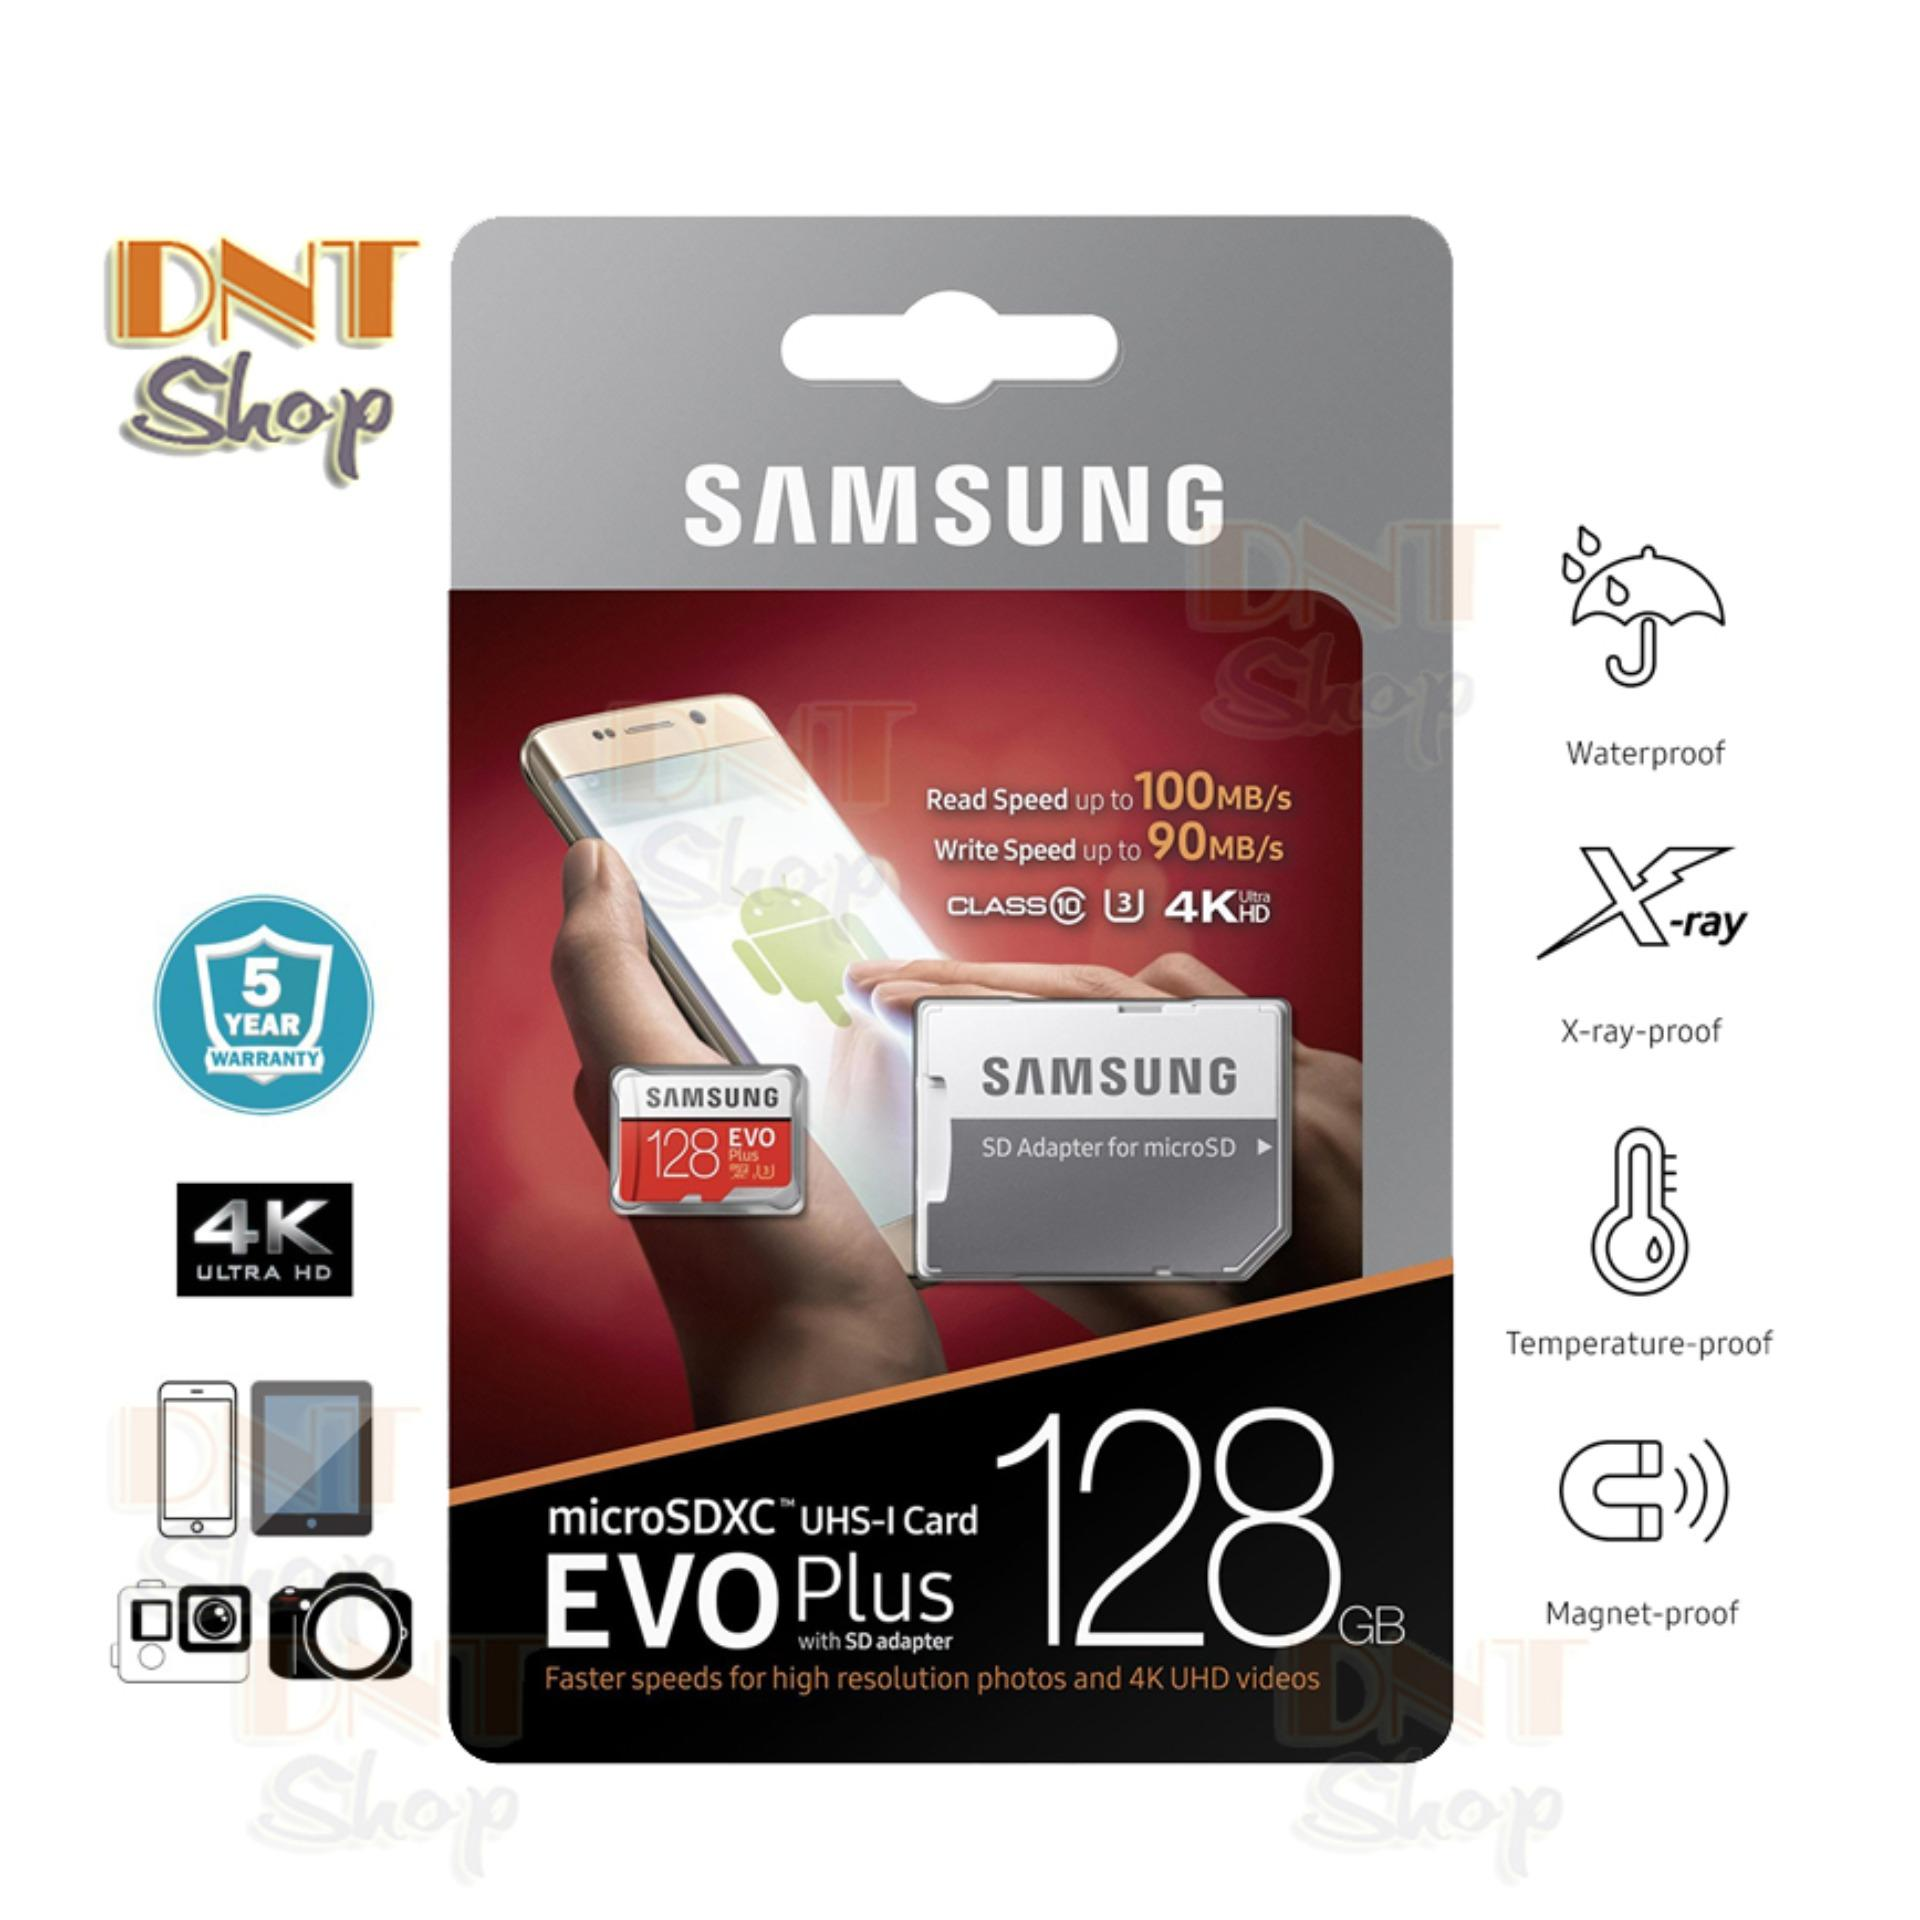 Mã Giảm Giá tại Lazada cho Thẻ Nhớ MicroSDXC Samsung EVO Plus 128GB U3 4K - W90MB-R100MB With Adapter